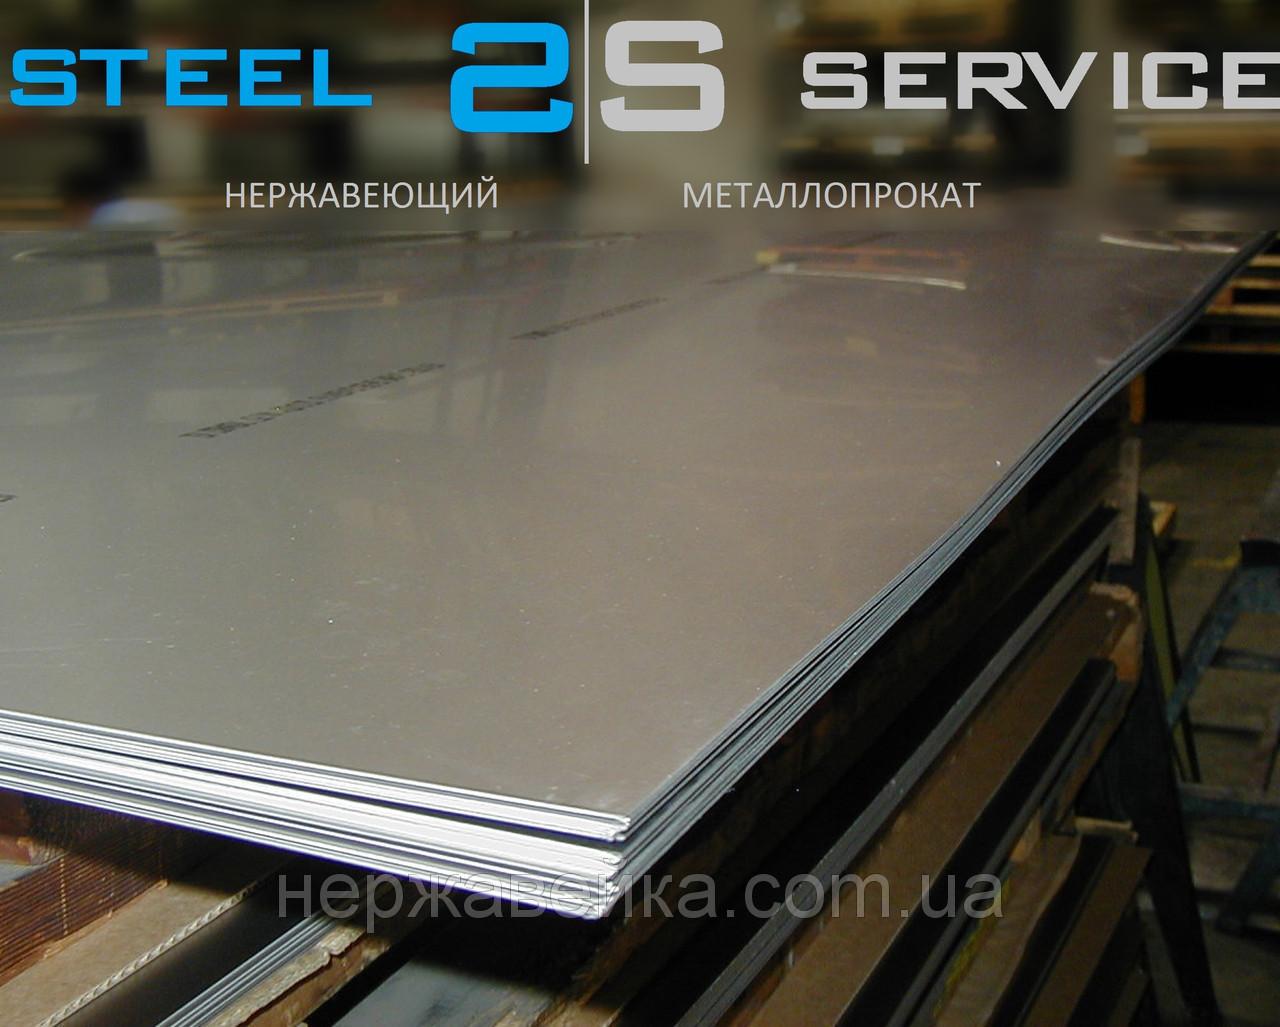 Нержавейка лист 4х1250х2500мм  AISI 316Ti(10Х17Н13М2Т) 2B - матовый,  кислотостойкий